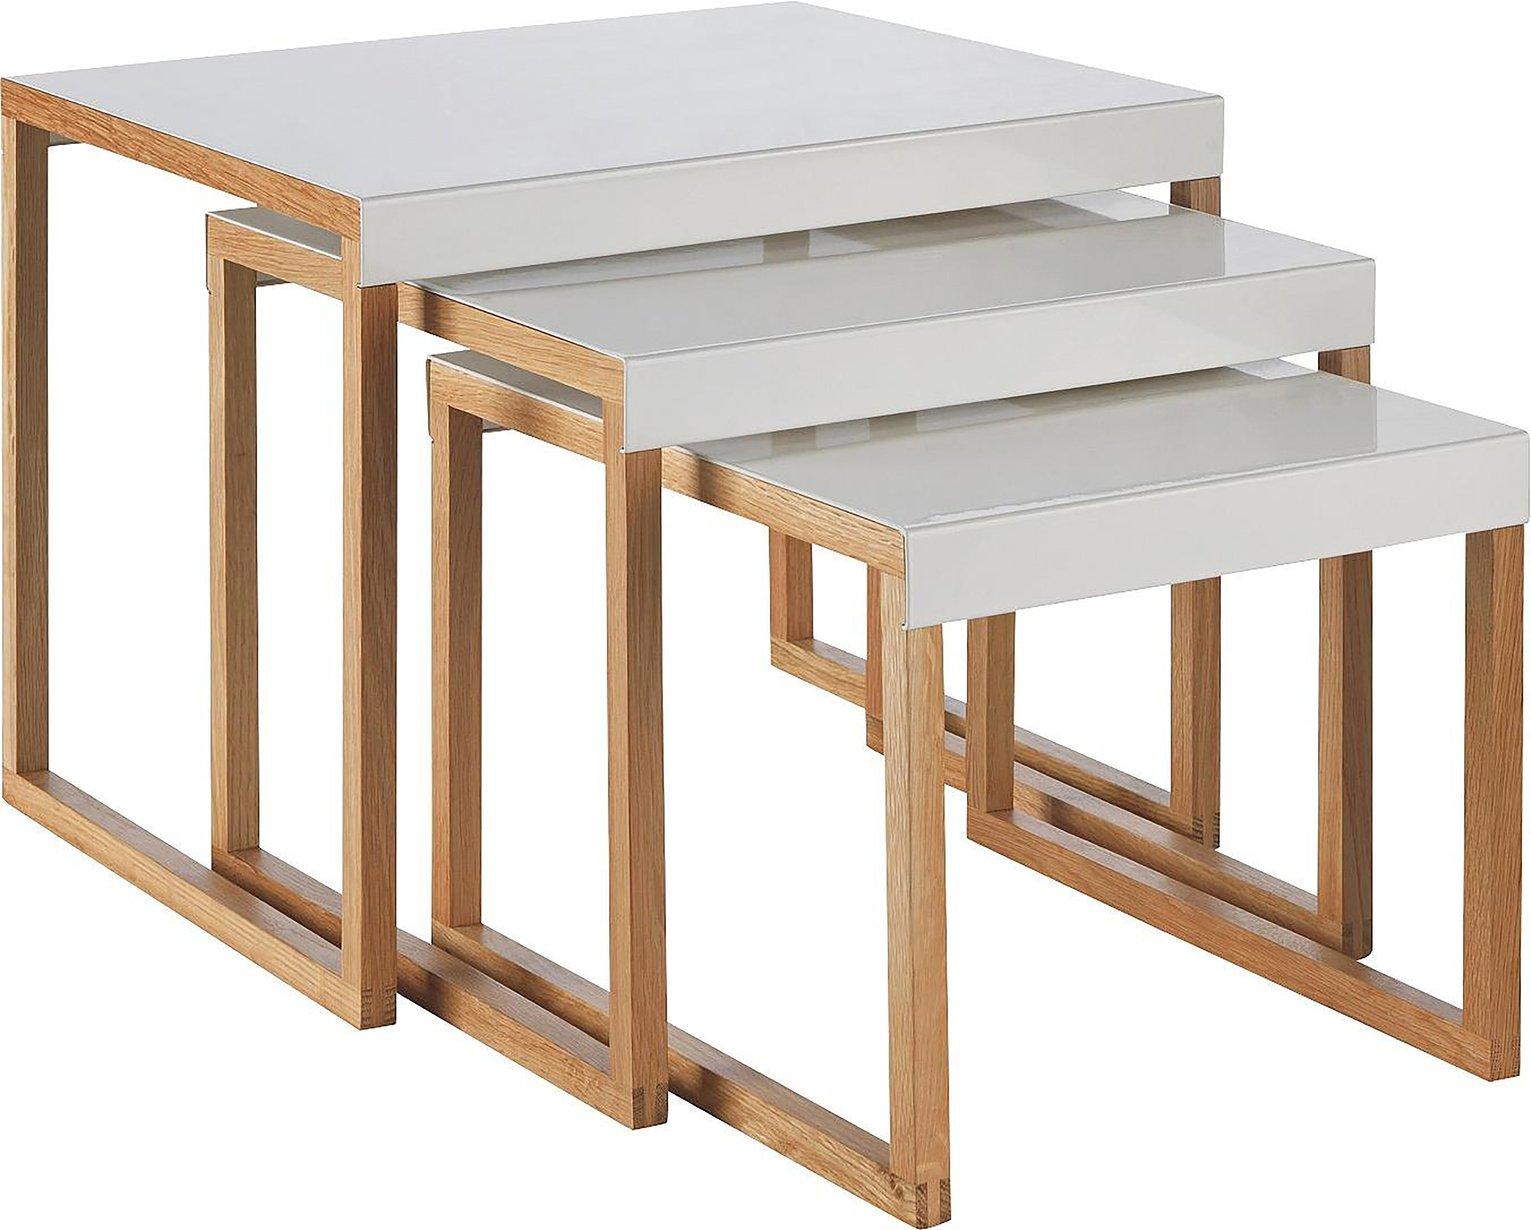 buy habitat kilo nest of 3 tables - white at argos.co.uk - your